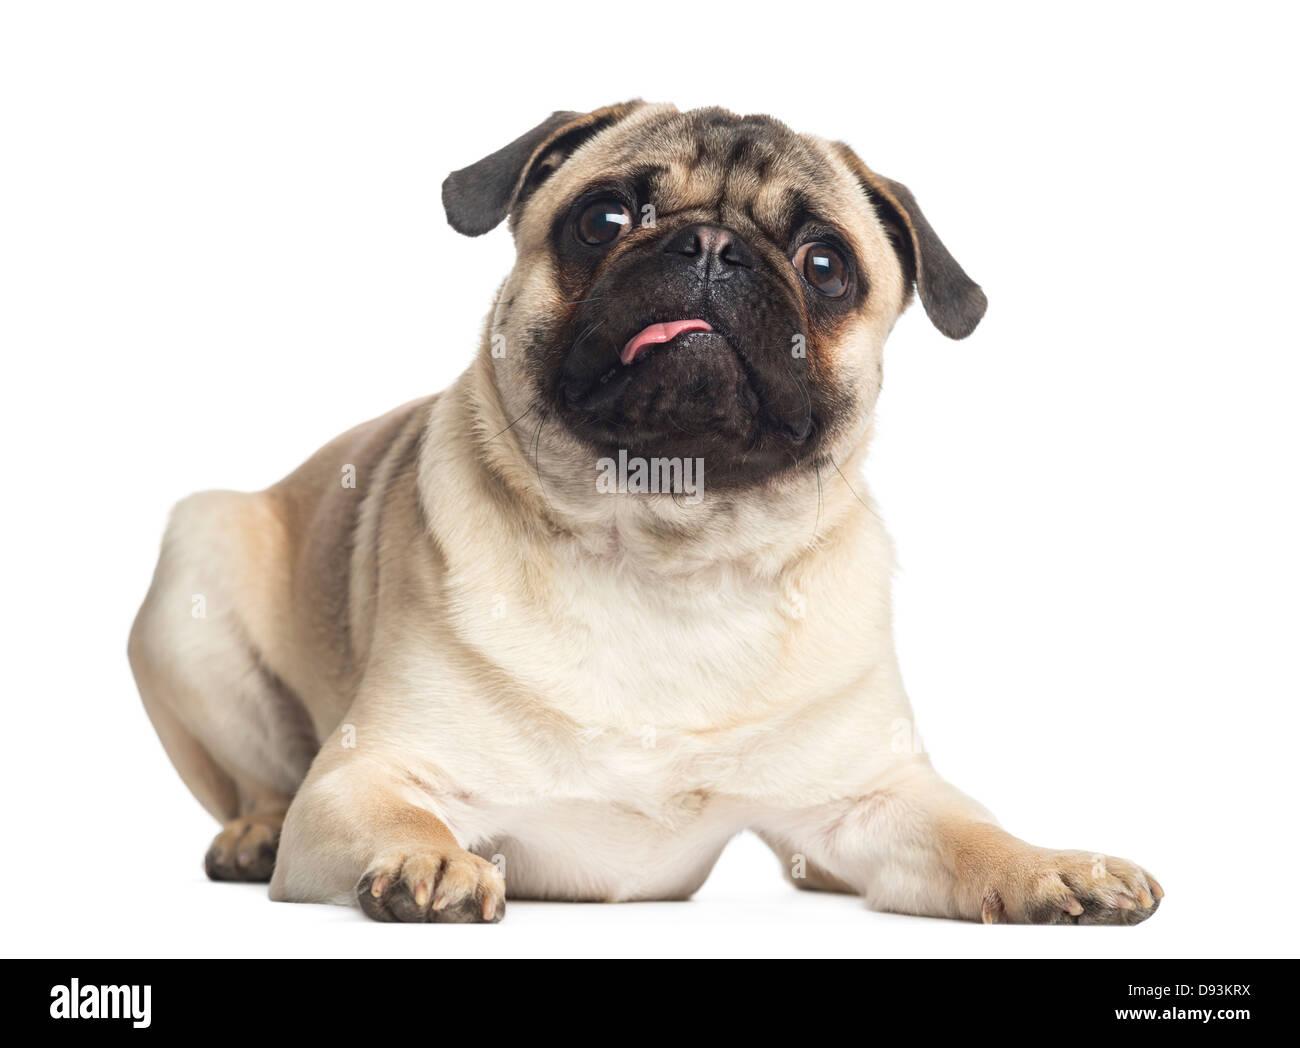 Pug, 1 year old, portrait lying against white background - Stock Image